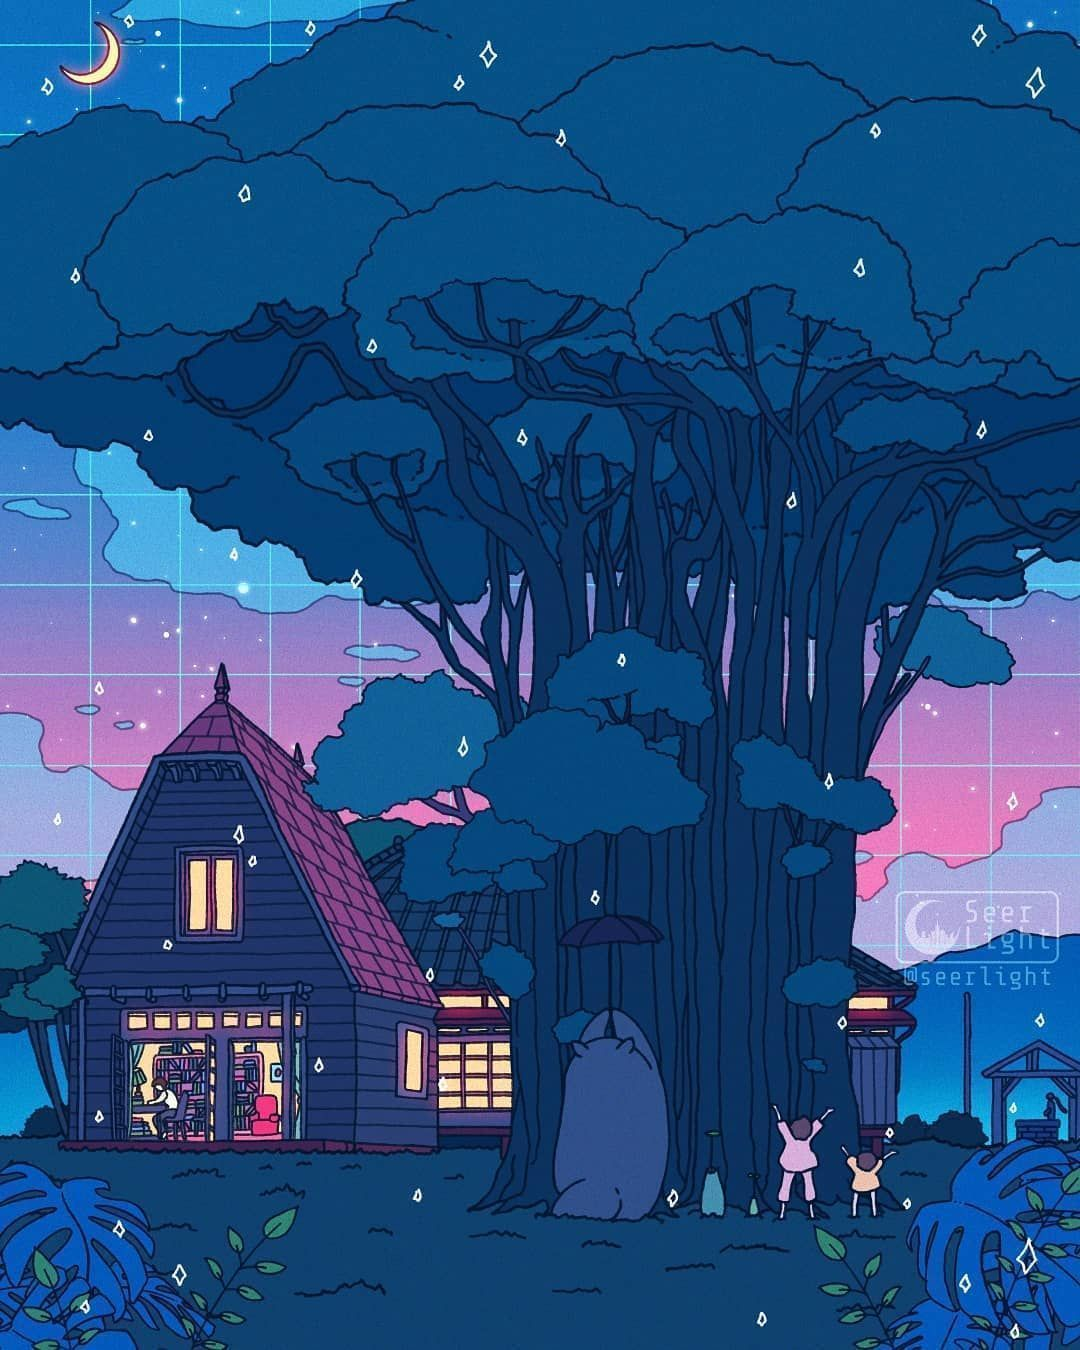 Wallpapers Ipad Wallpapers Ipad In 2020 Ghibli Artwork Studio Ghibli Movies Ghibli Art